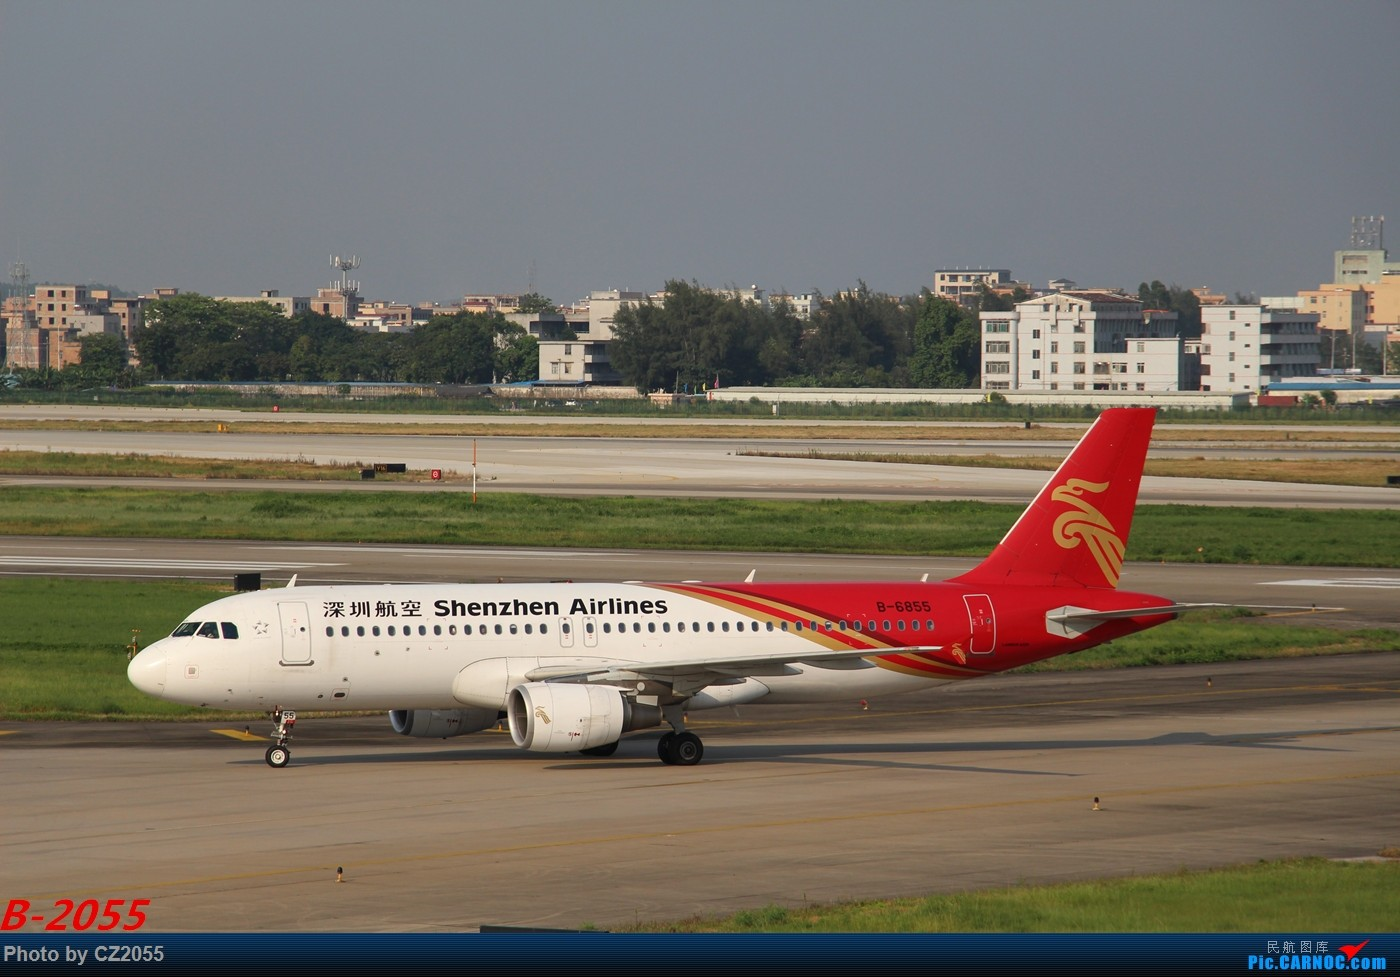 Re:[原创]Re:[原创]【广东青少年拍机小队】【C-Z-2055】发完737和宽体就升级320,那就再发一组320系列。 AIRBUS A320-200 B-6855 中国广州白云国际机场